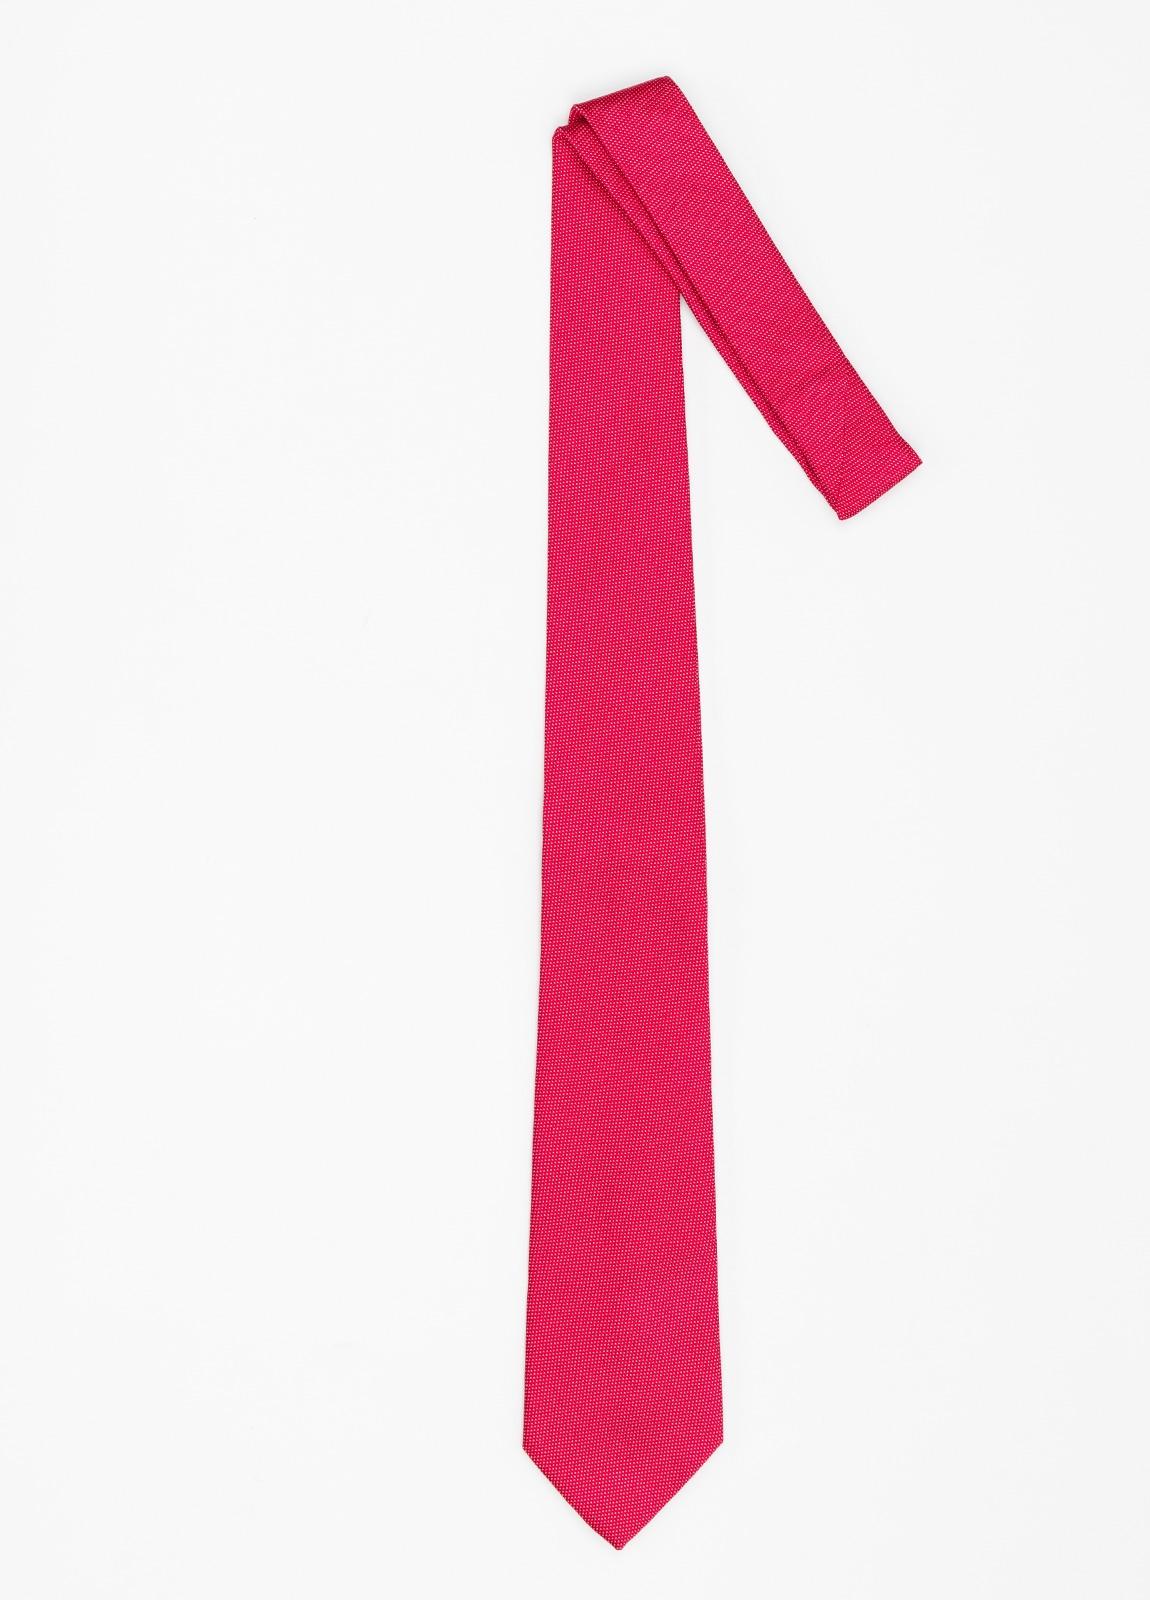 Corbata formal wear micro textura, color rojo pala 7,5 CM 100% Seda. - Ítem1